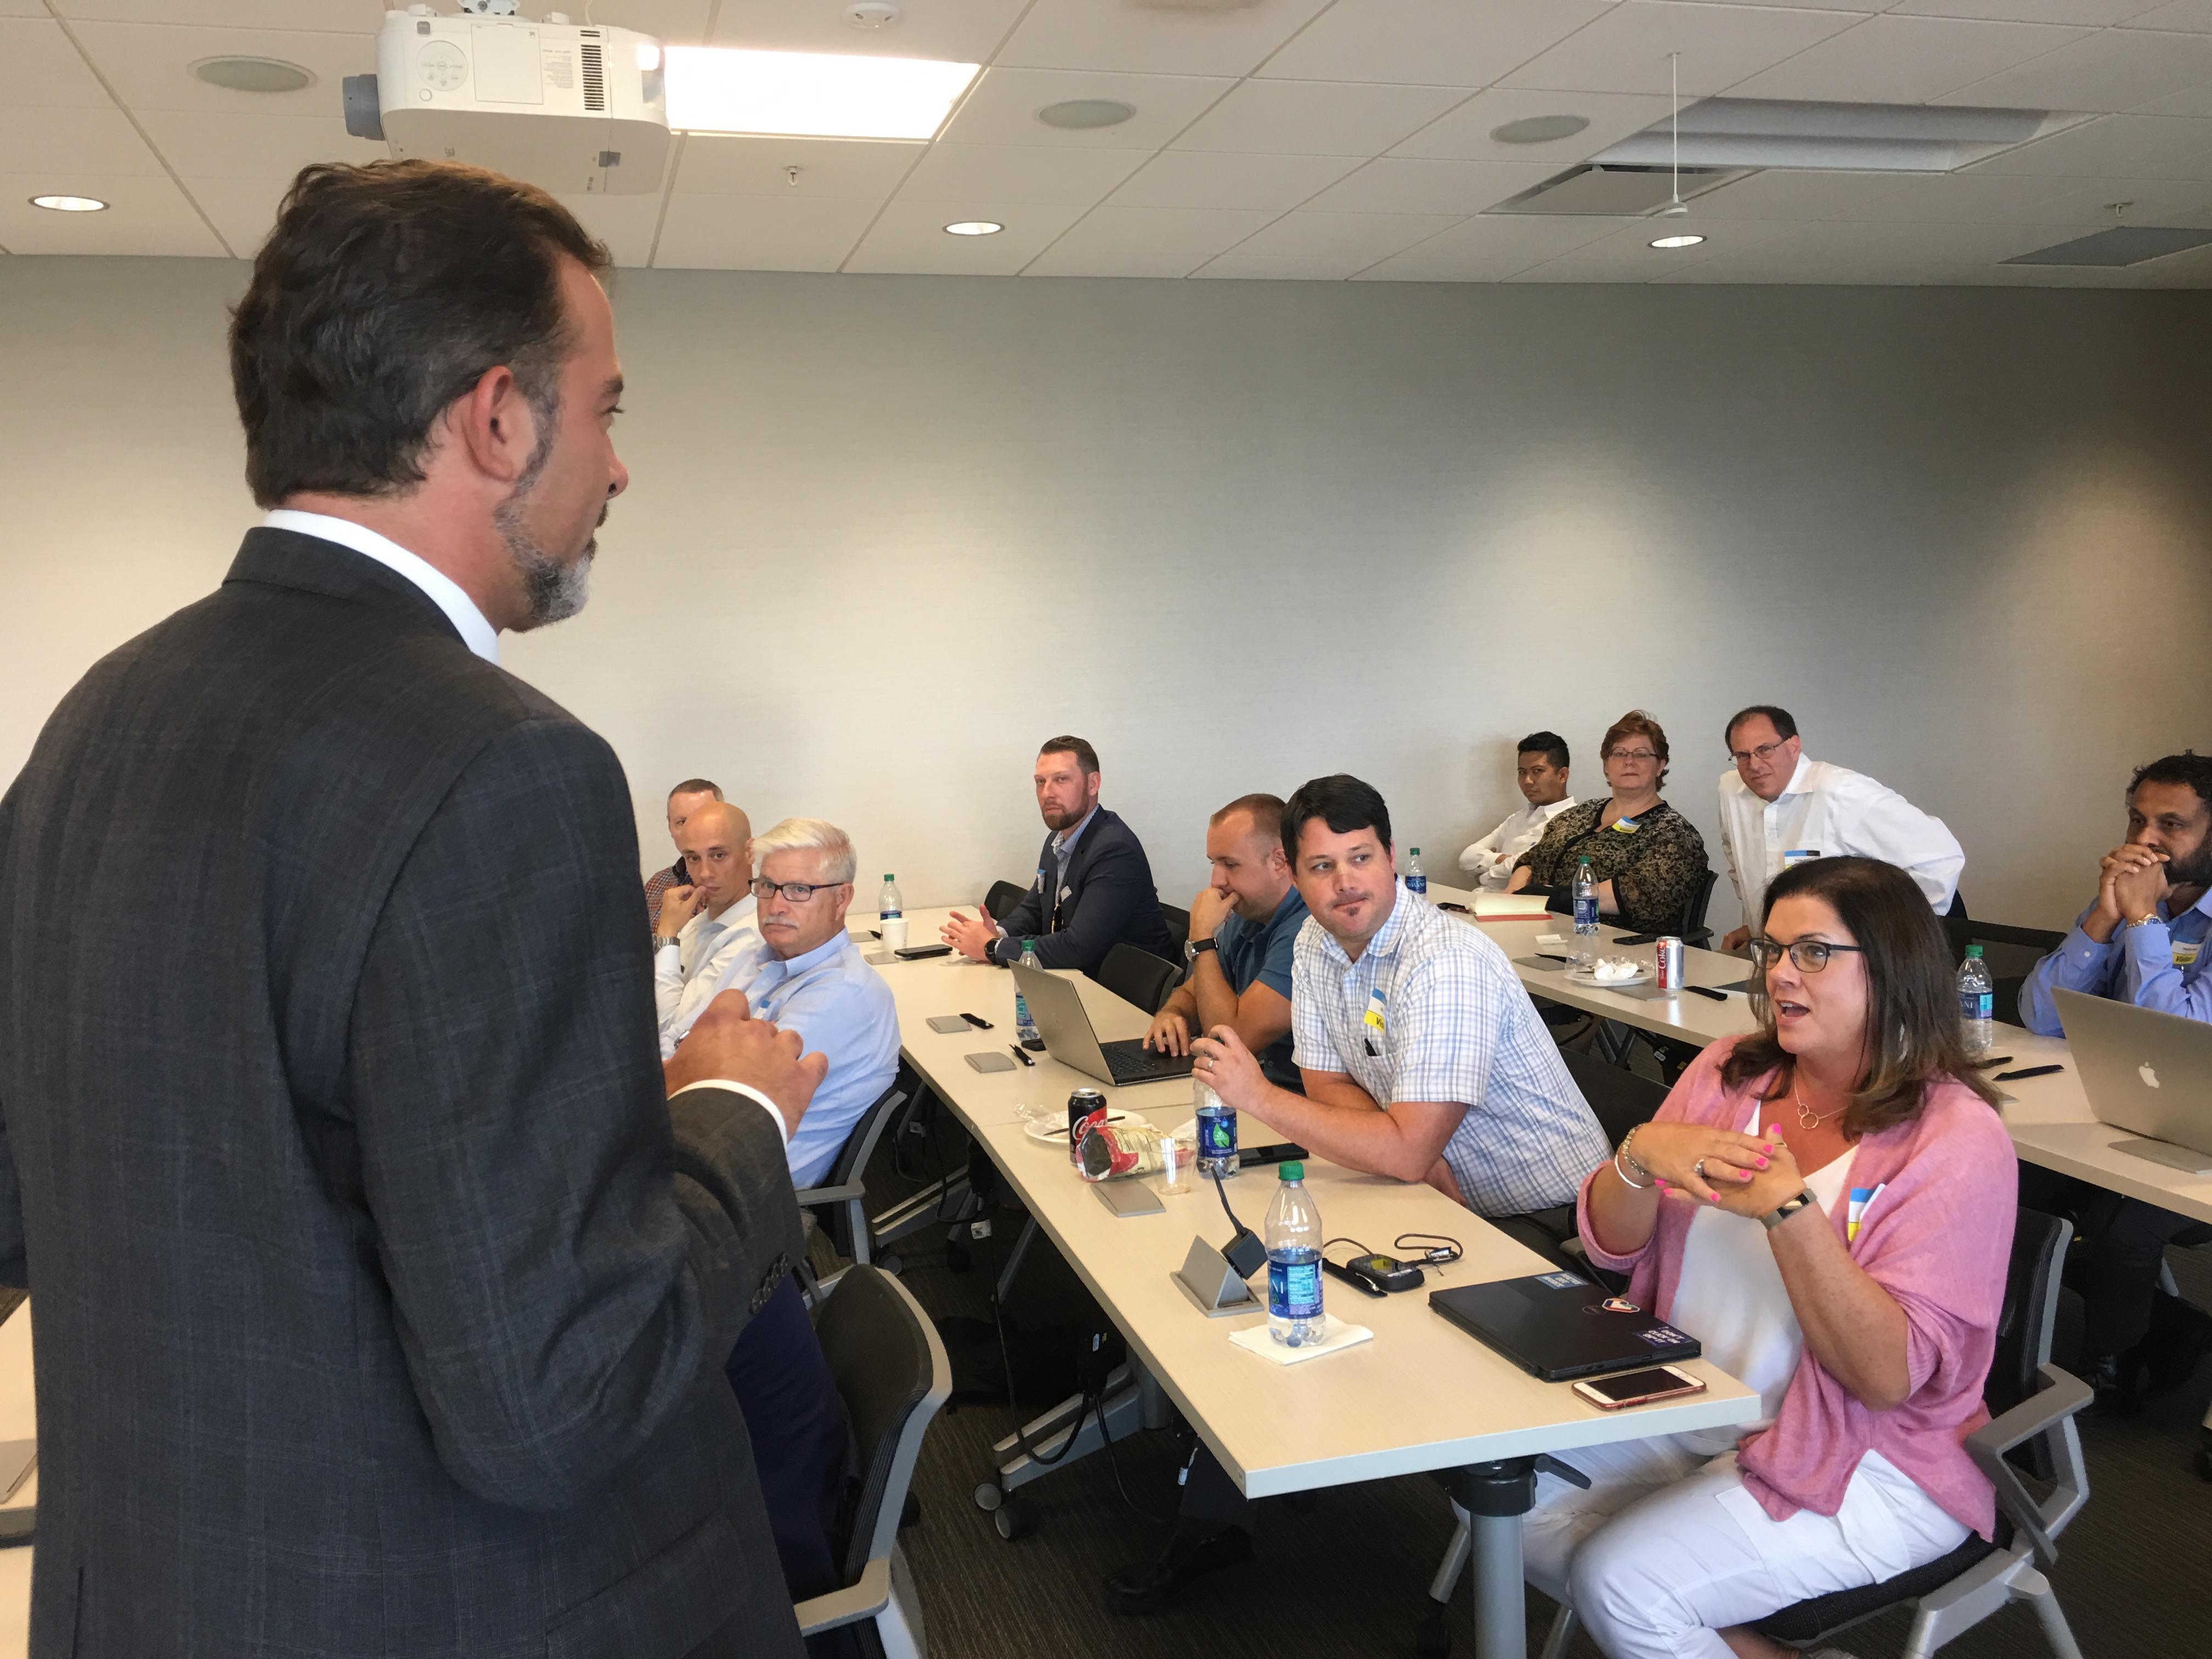 HITRUST Community Extension Program (CEP) in Nashville - Mike Parisi